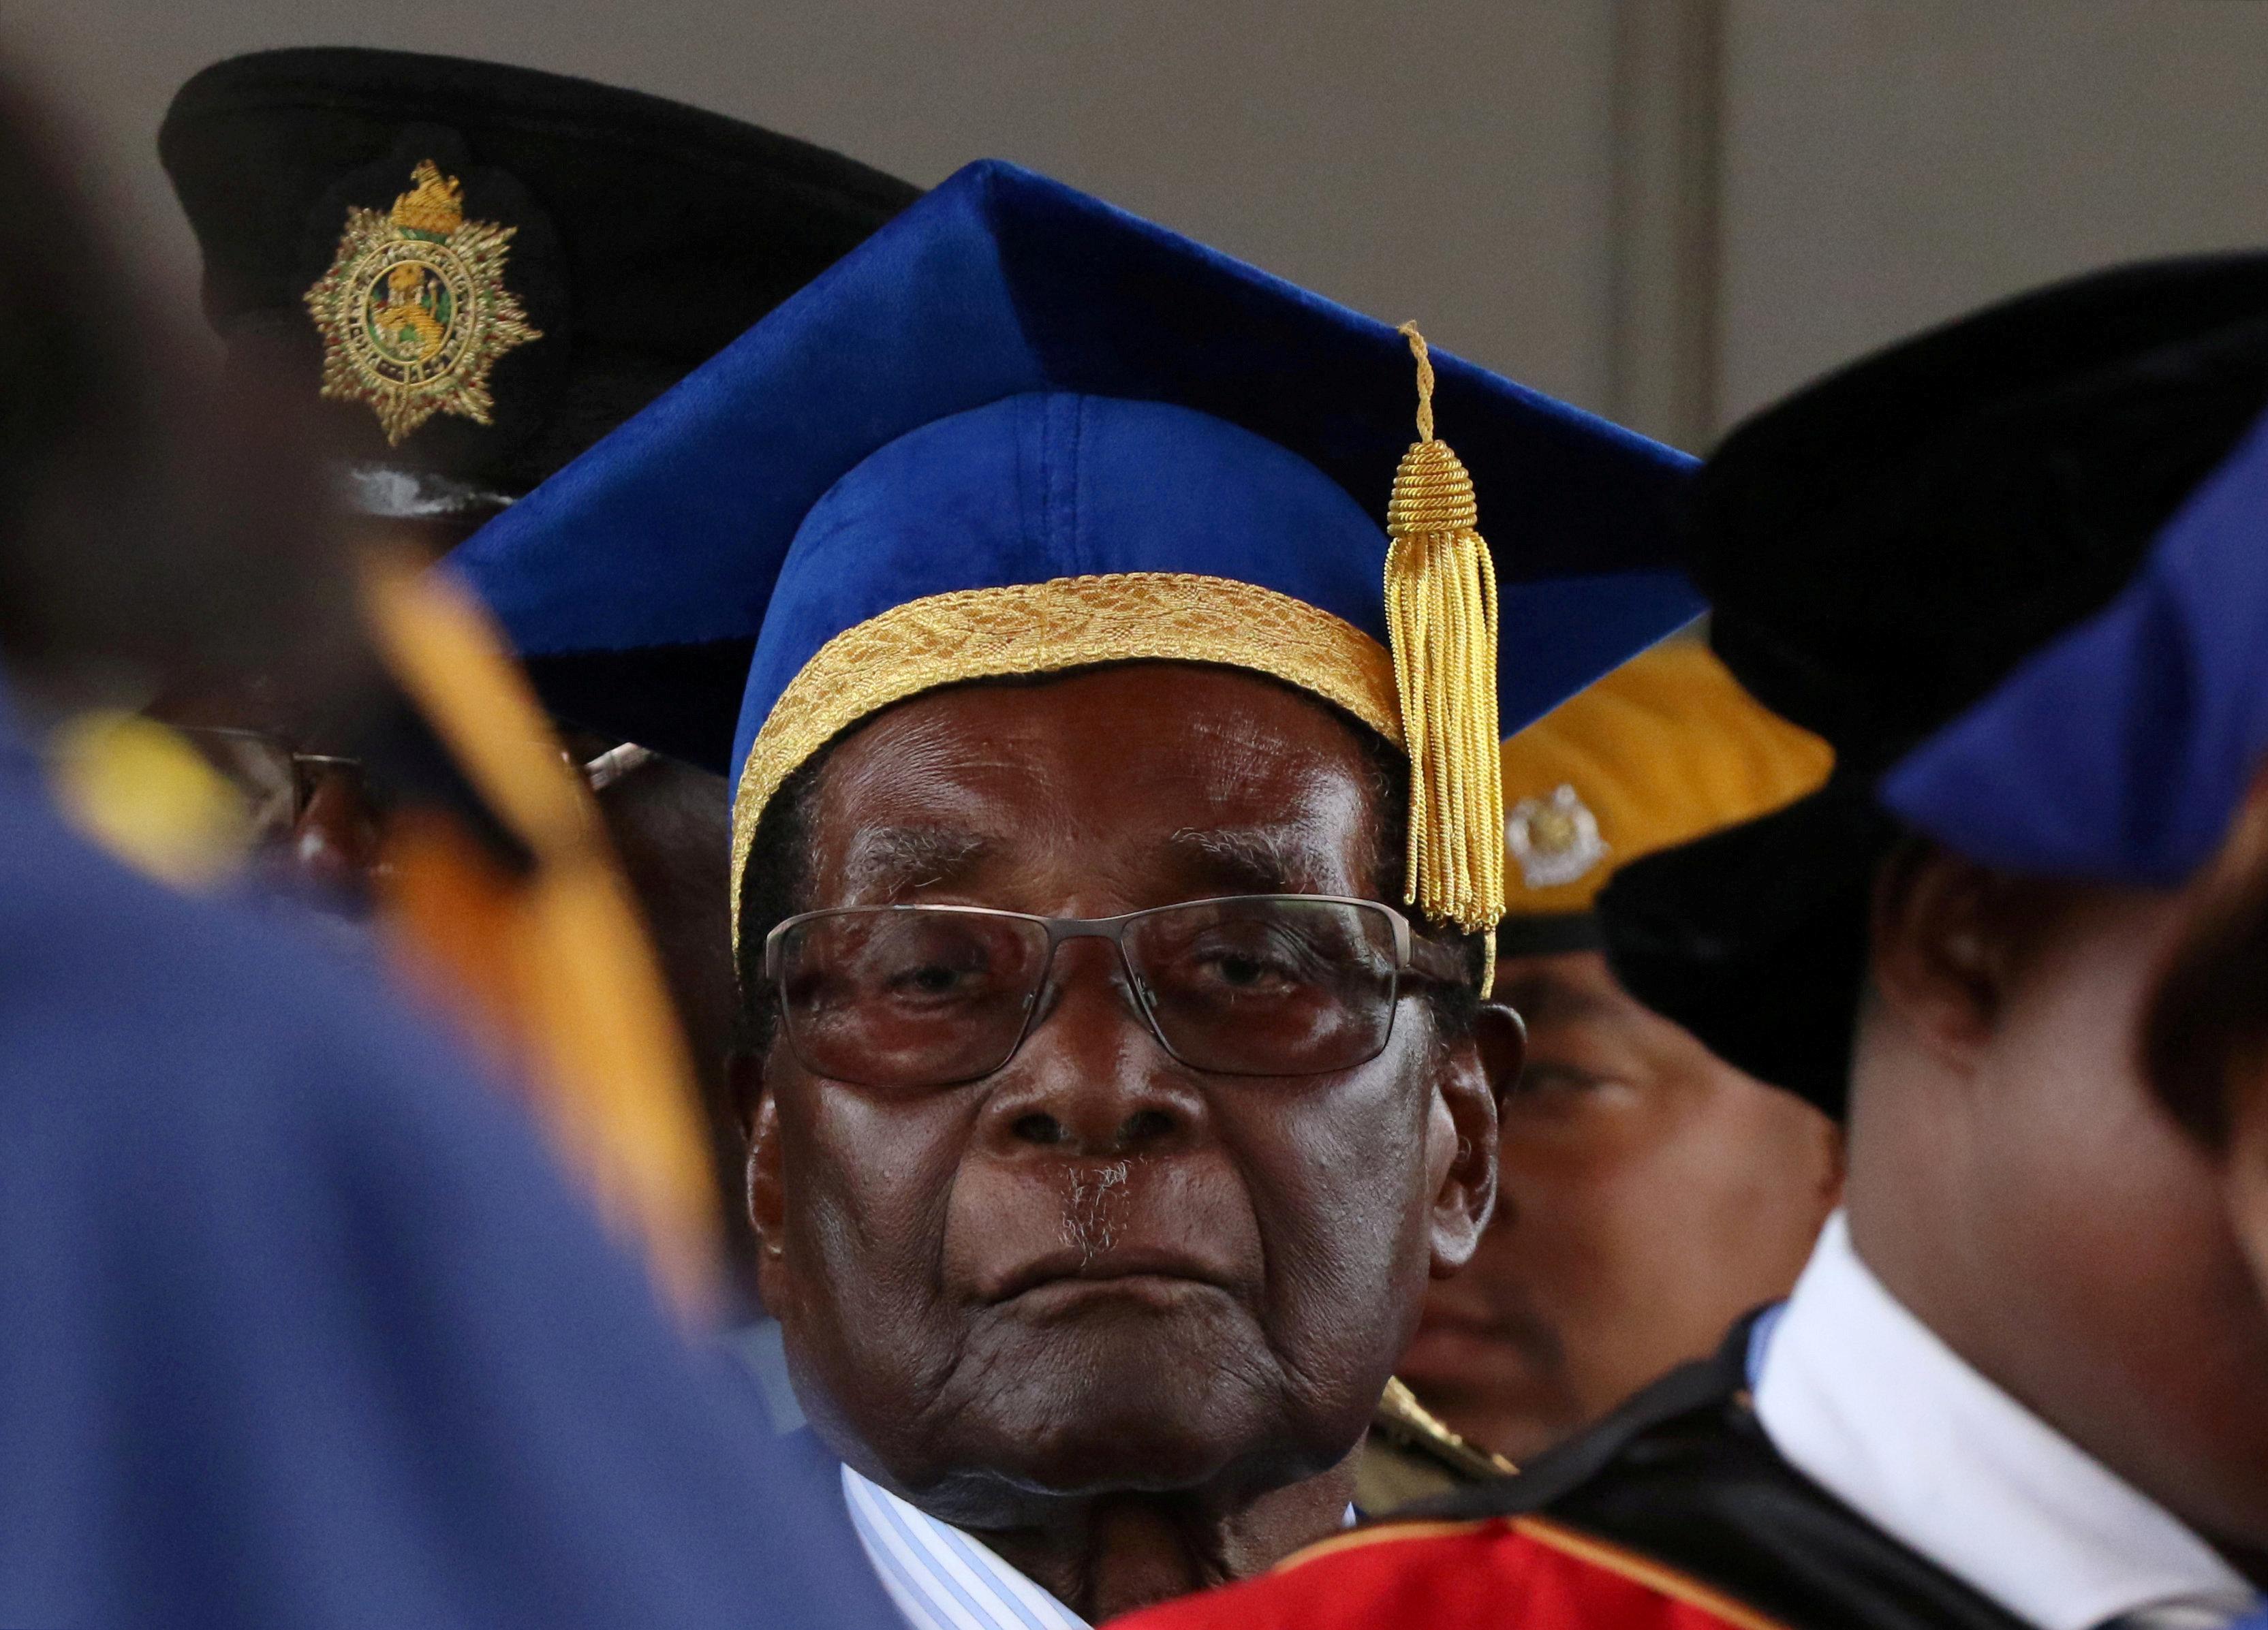 Robert Mugabe at a university graduation ceremony on Friday